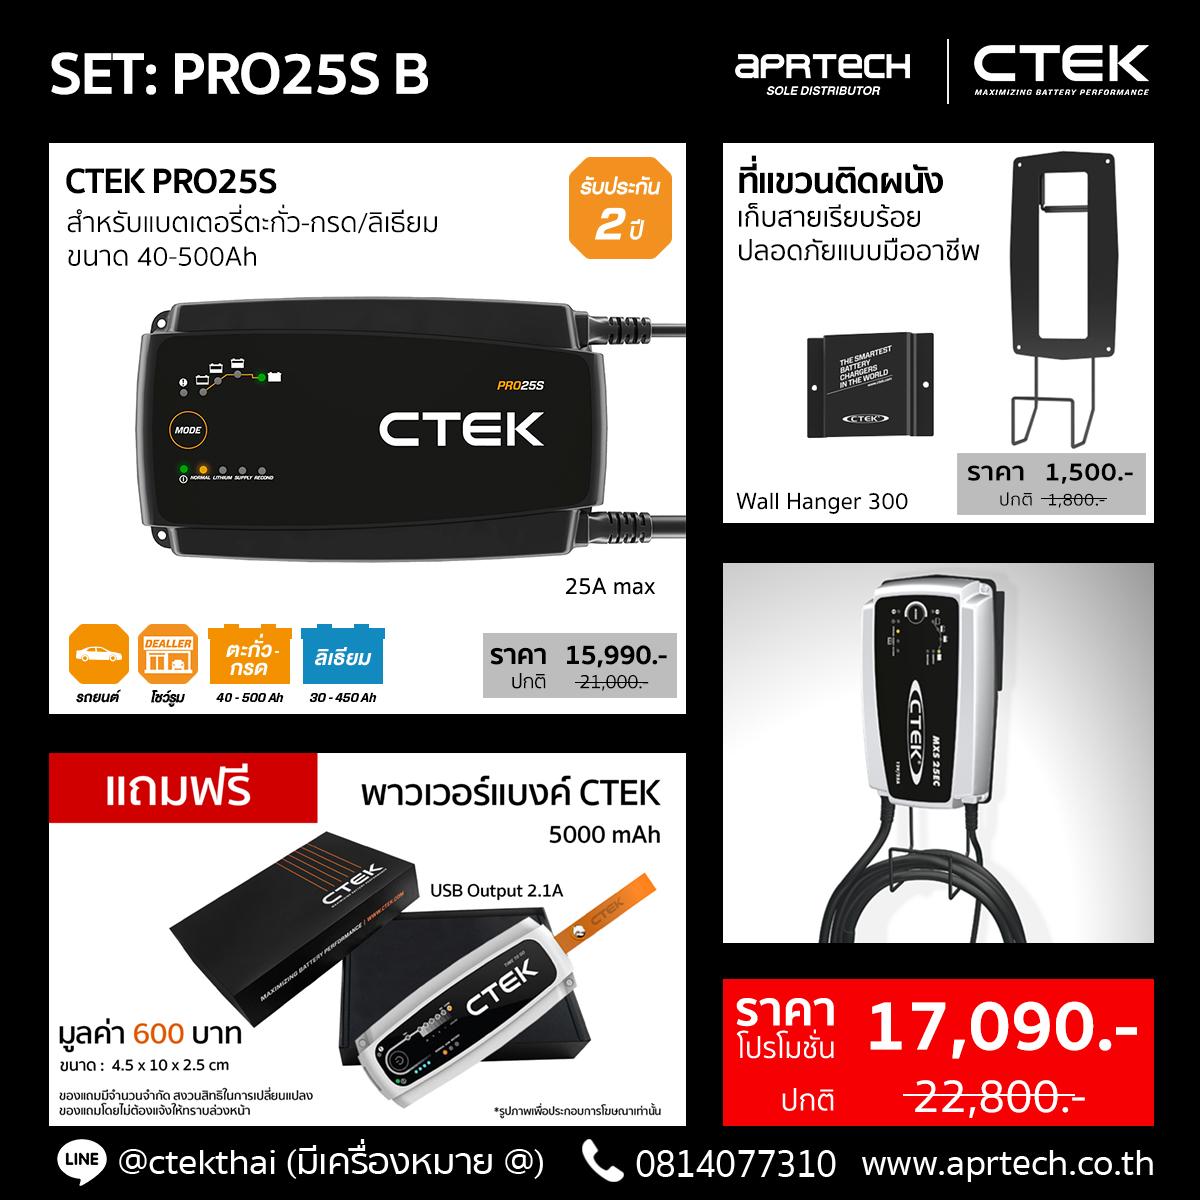 SET PRO25S B (CTEK PRO25S + Wall Hanger 300)